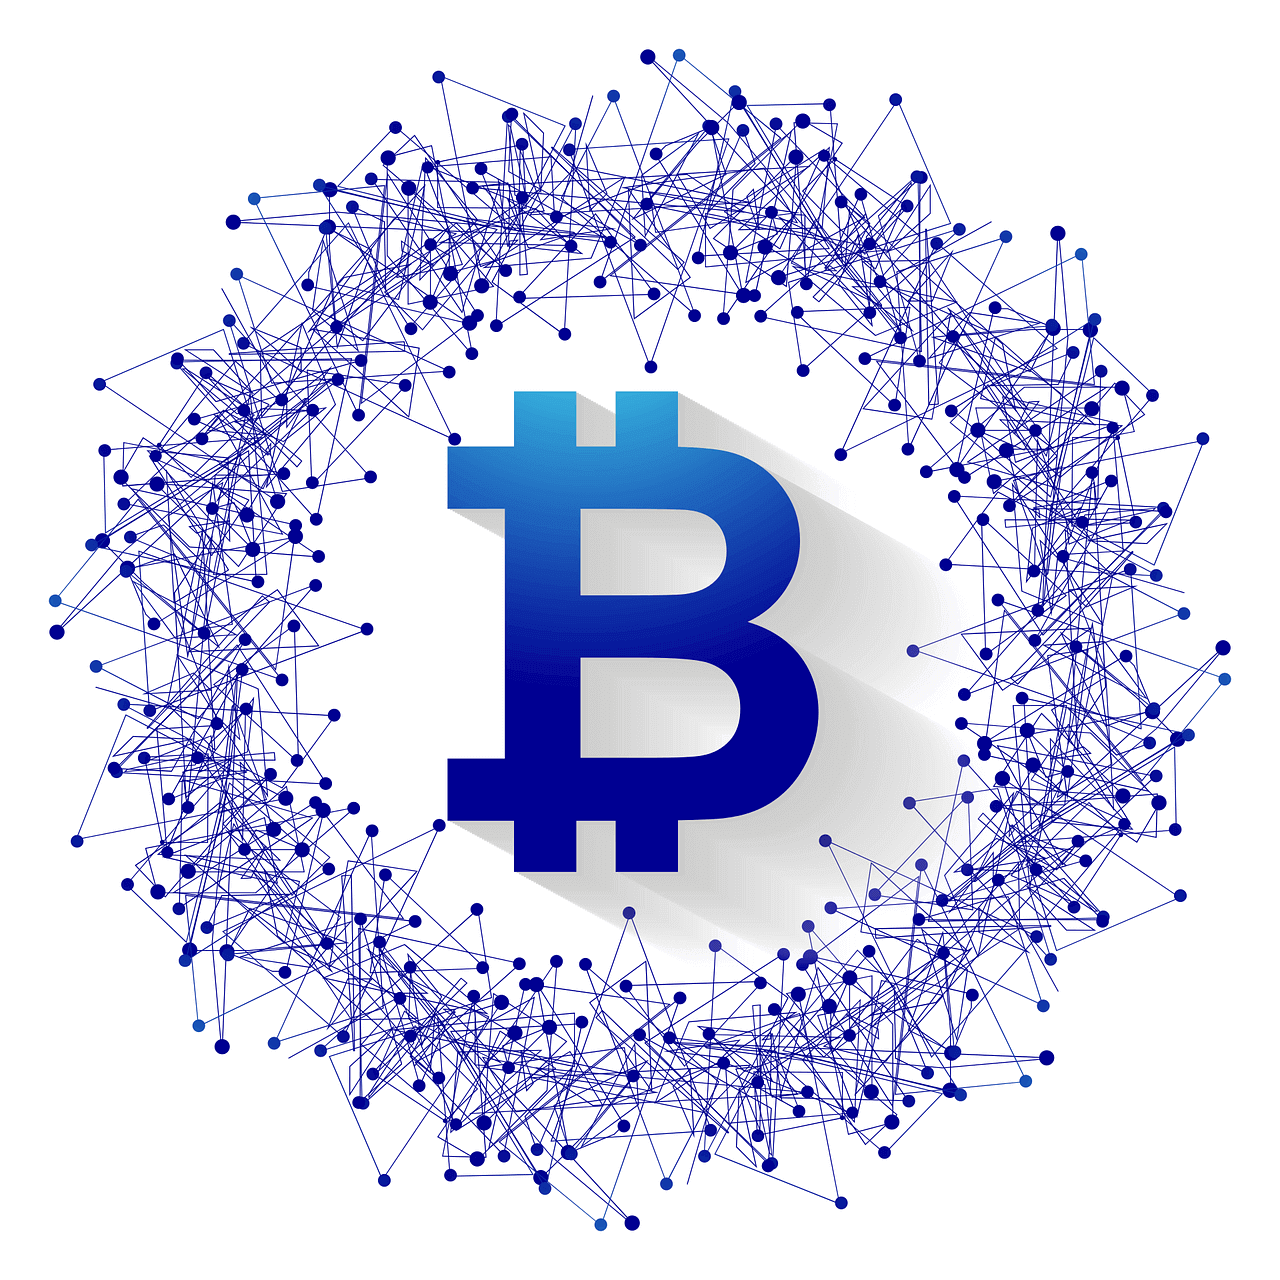 Bitcoin Wettbewerbsgesellschaft zu kooperative